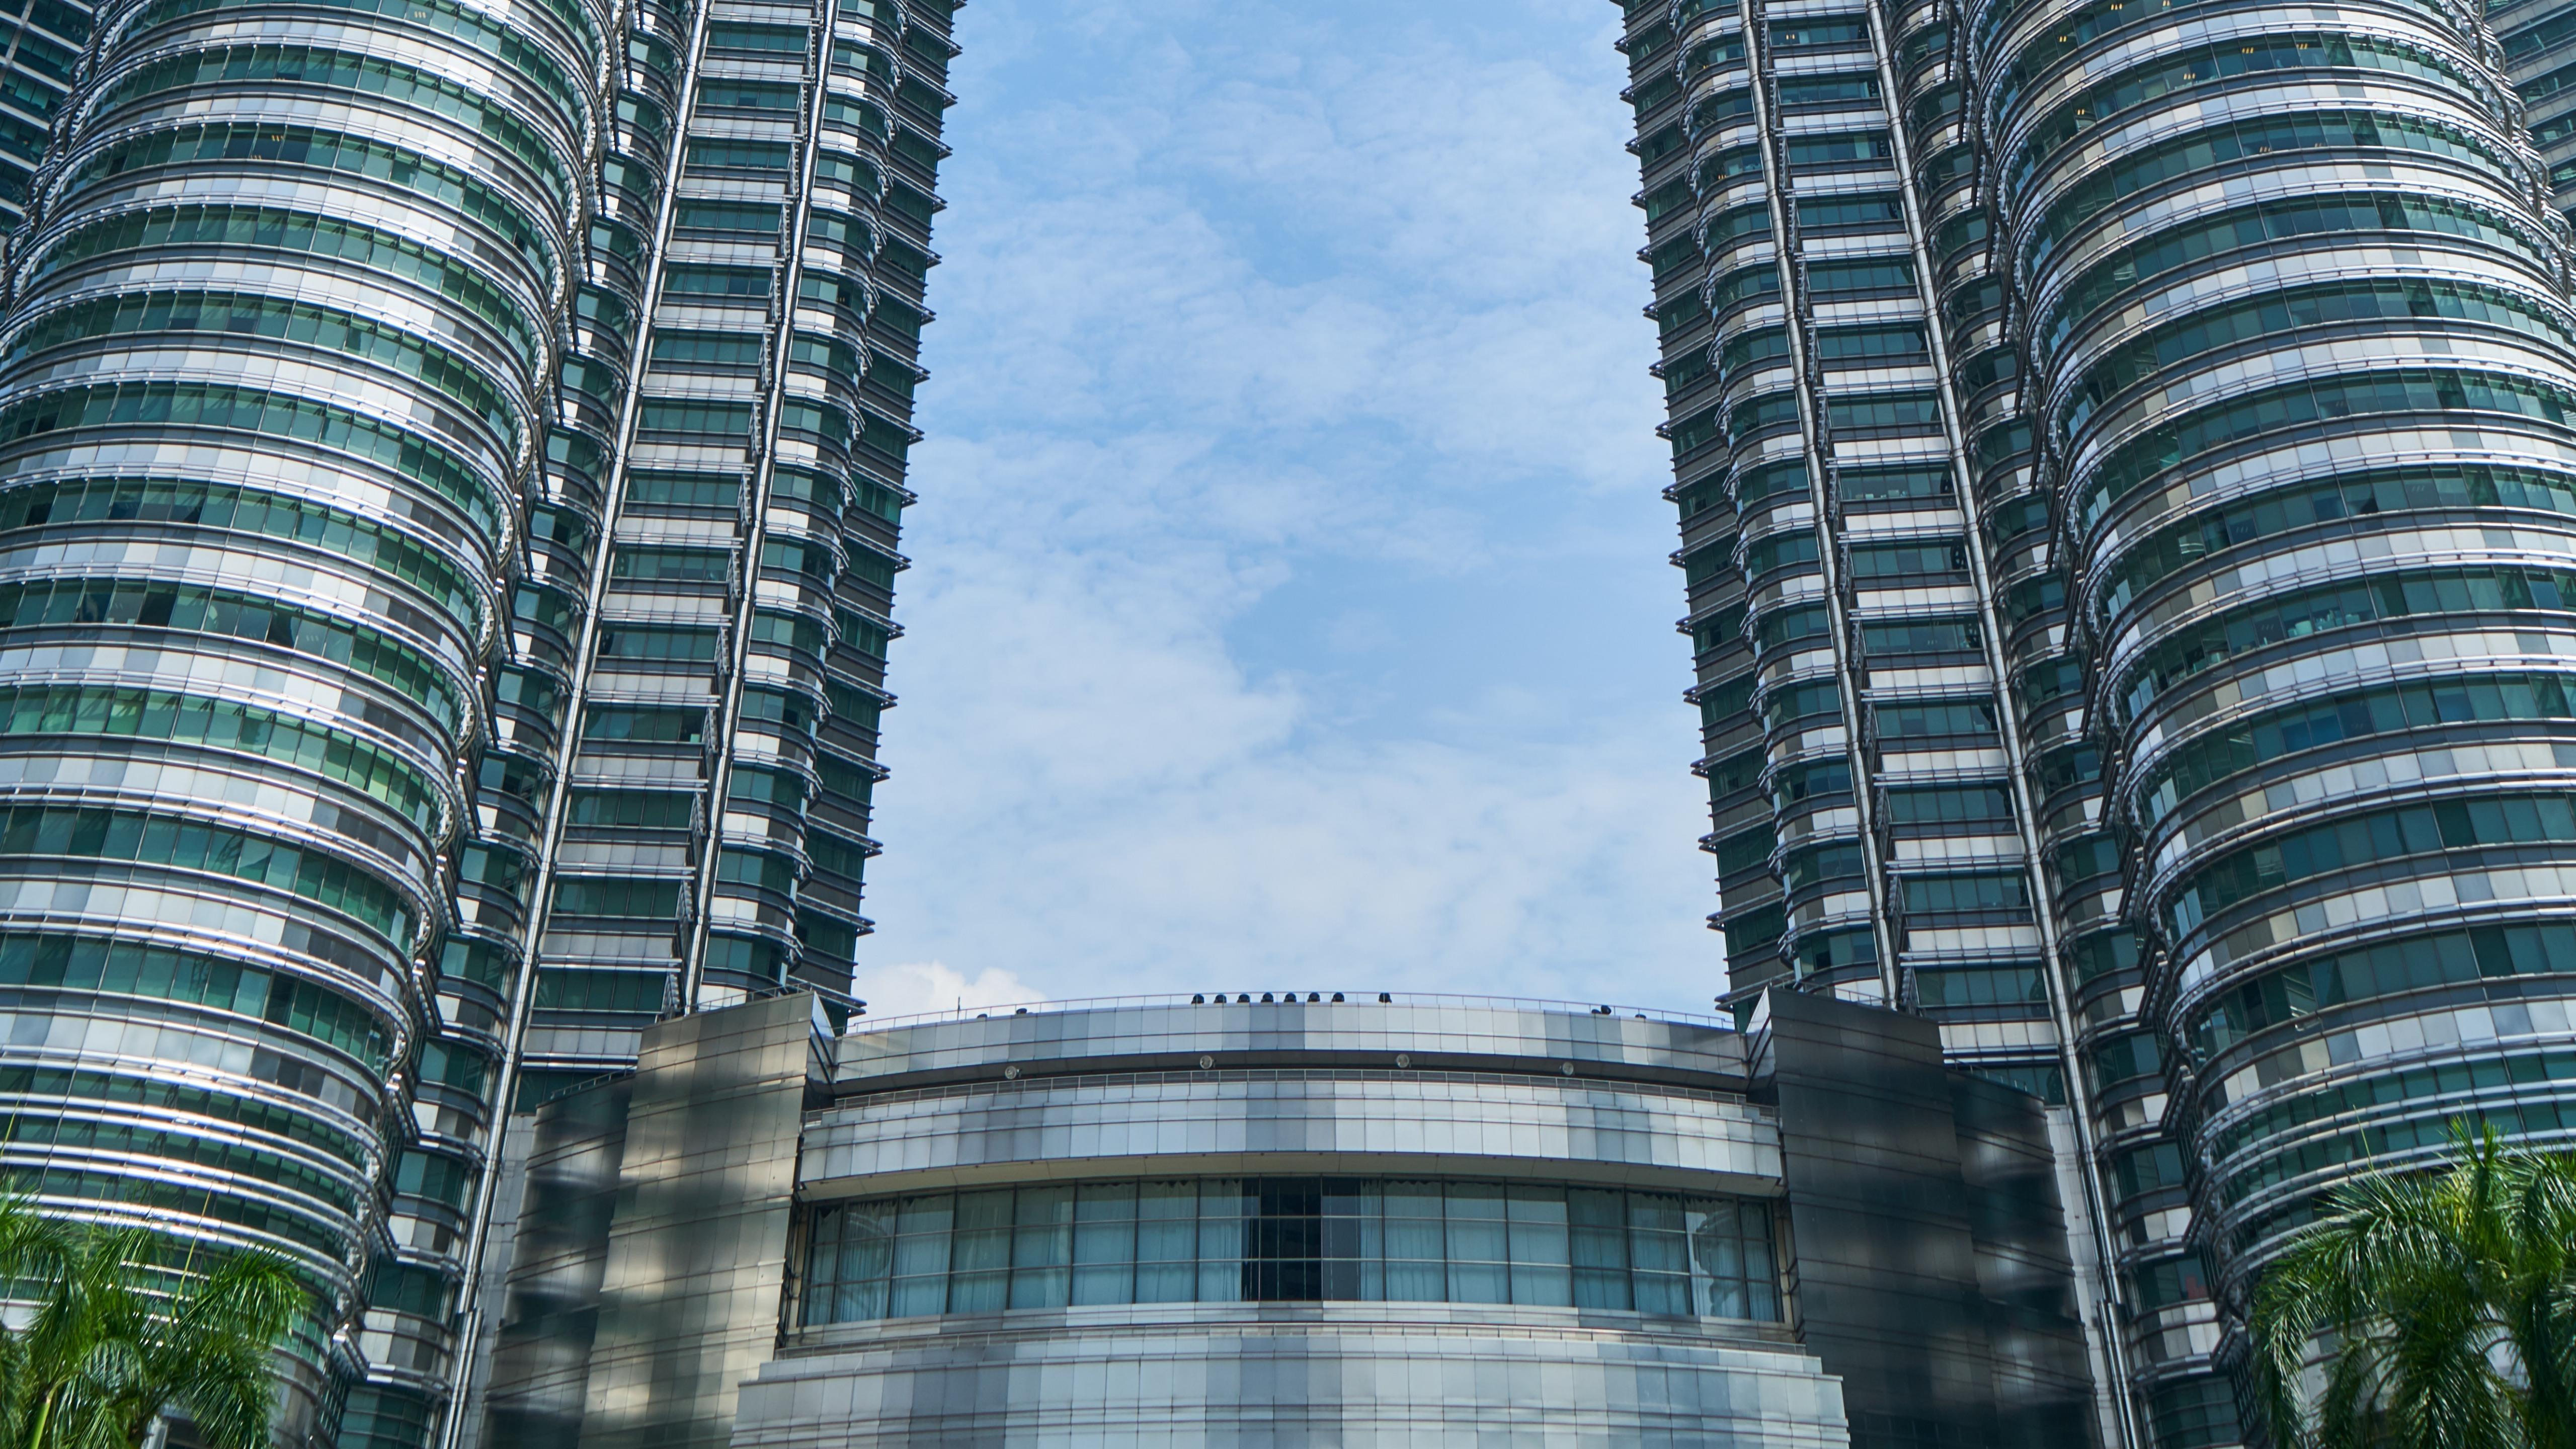 Petronas Towers Bottom Floors wallpaper